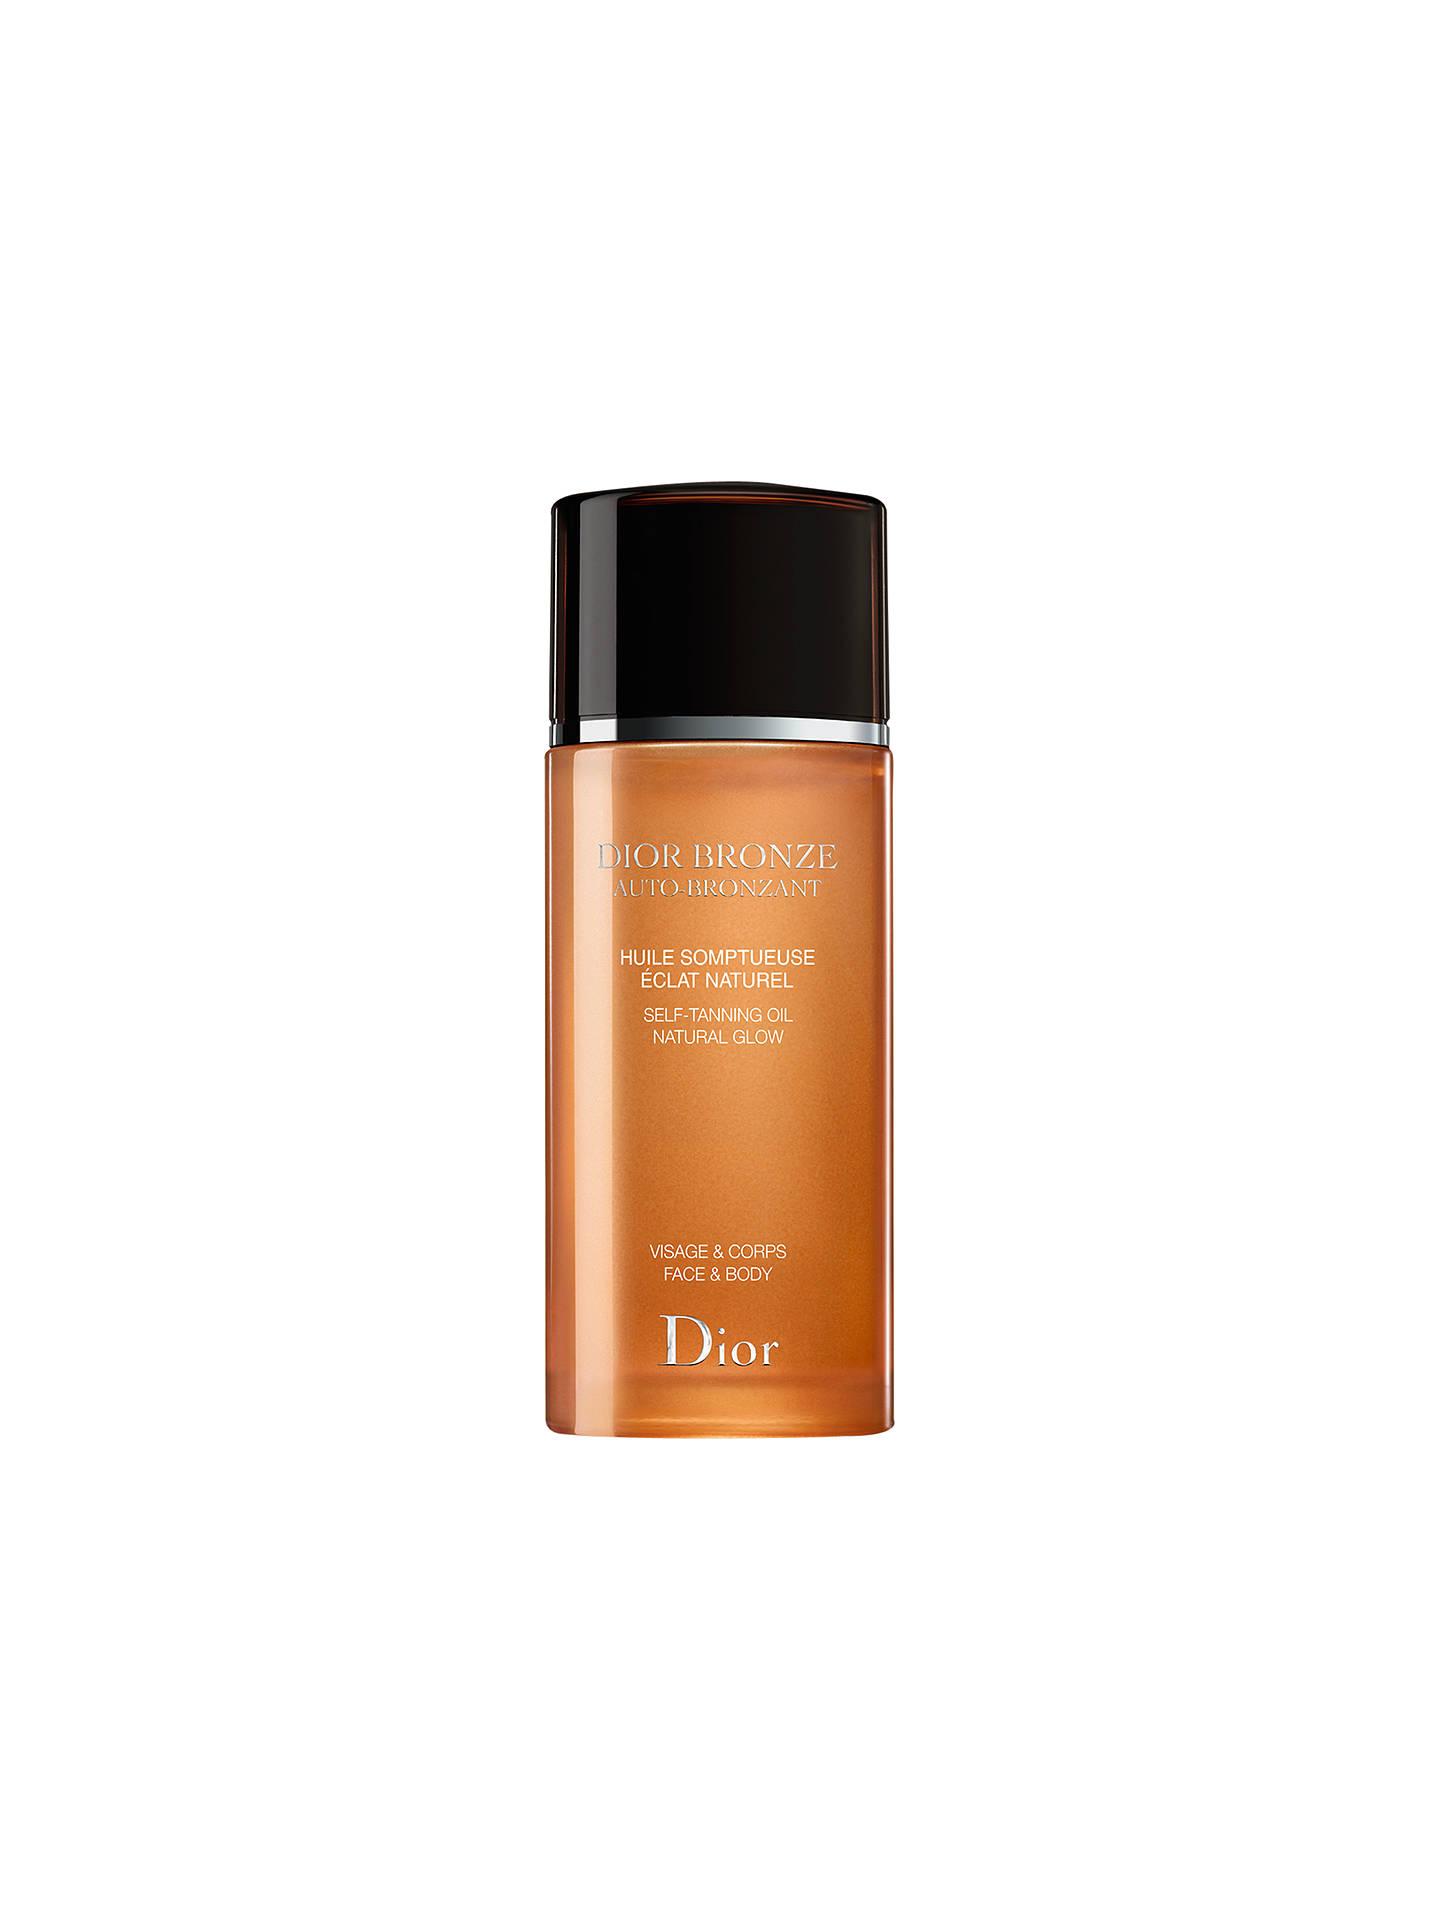 08d4528e Dior Dior Bronze Self Tanning Oil Natural Glow - Face & Body, 100ml ...